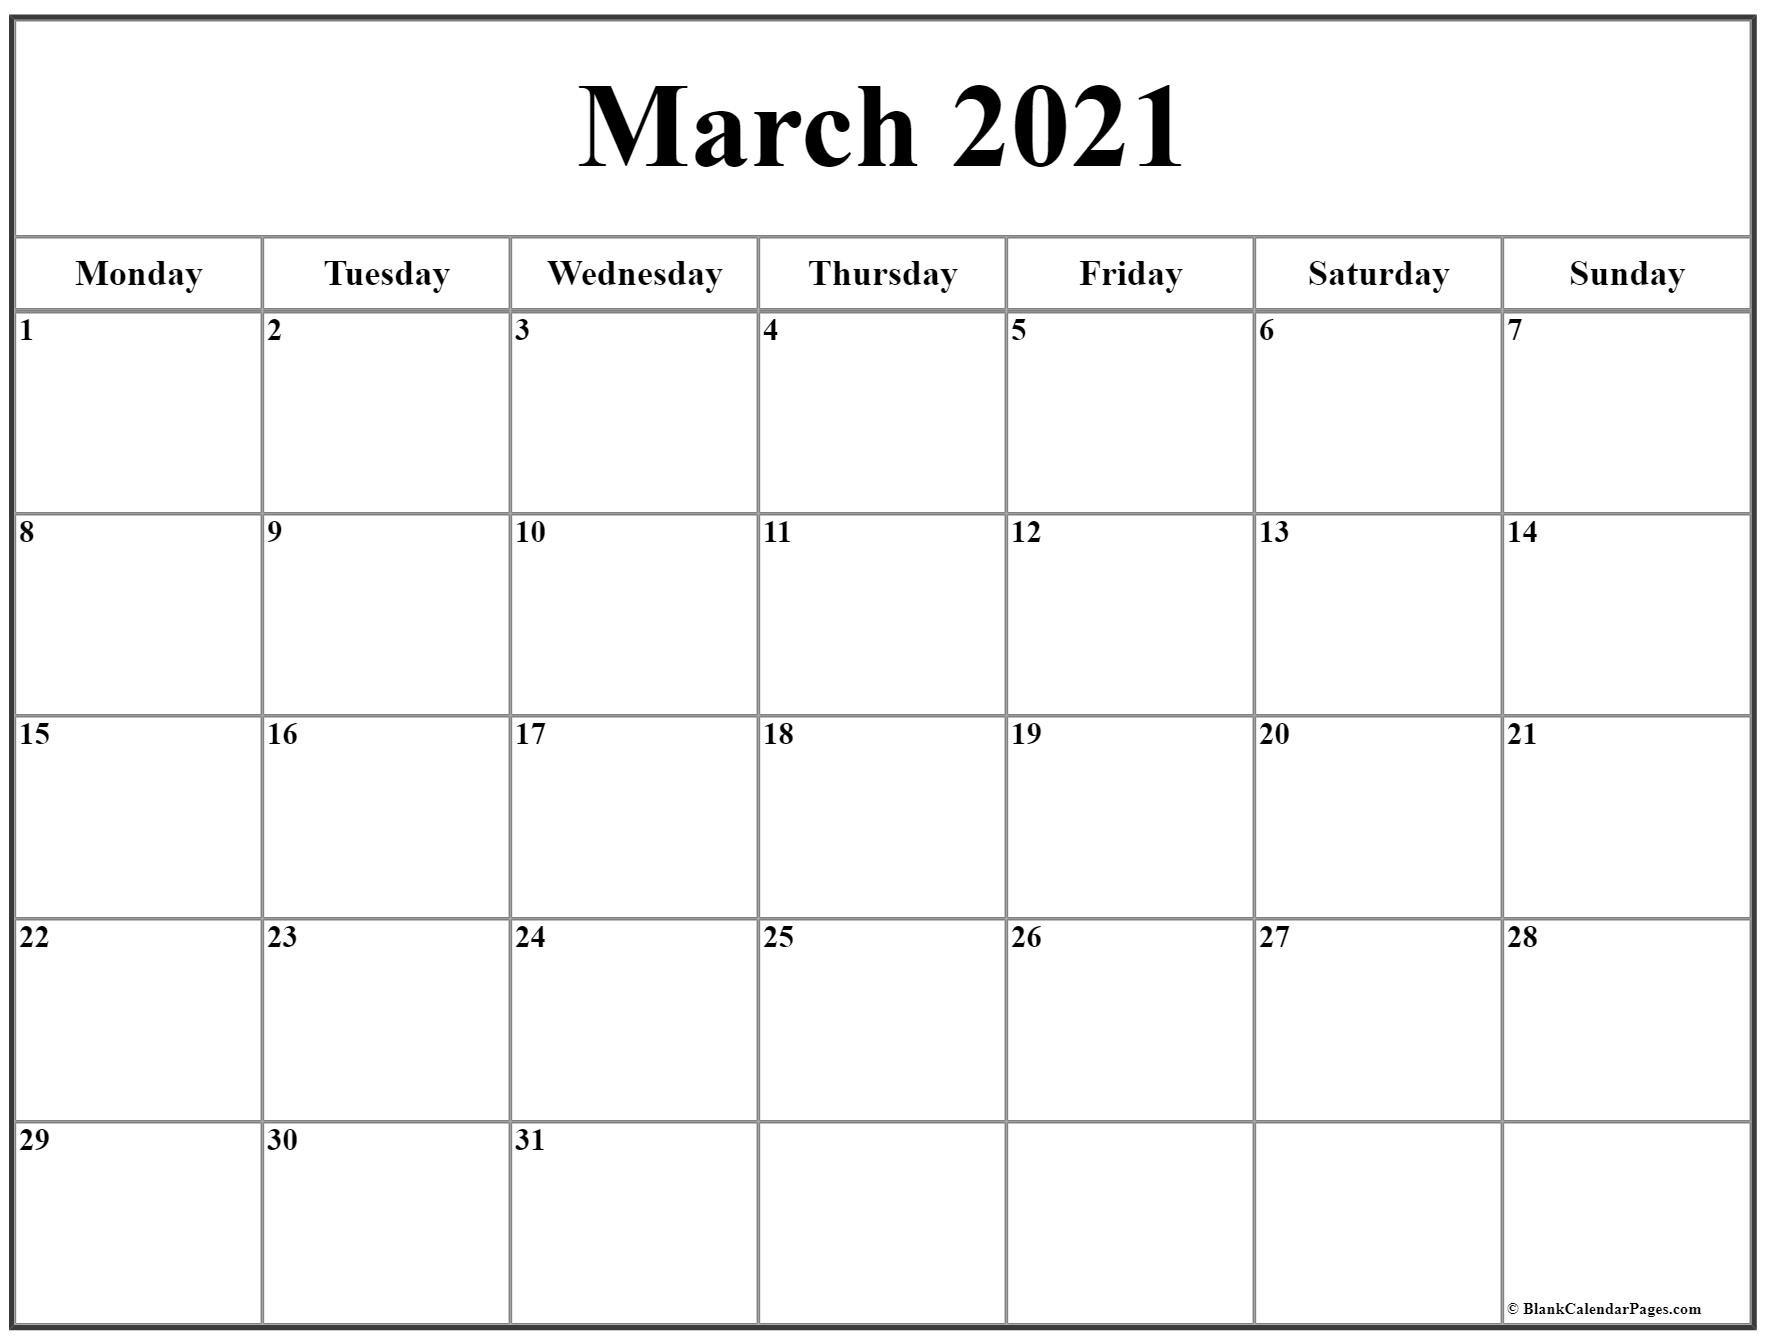 March 2021 Monday Calendar   Monday To Sunday-Calendar 2021 Sat Thru Sunday